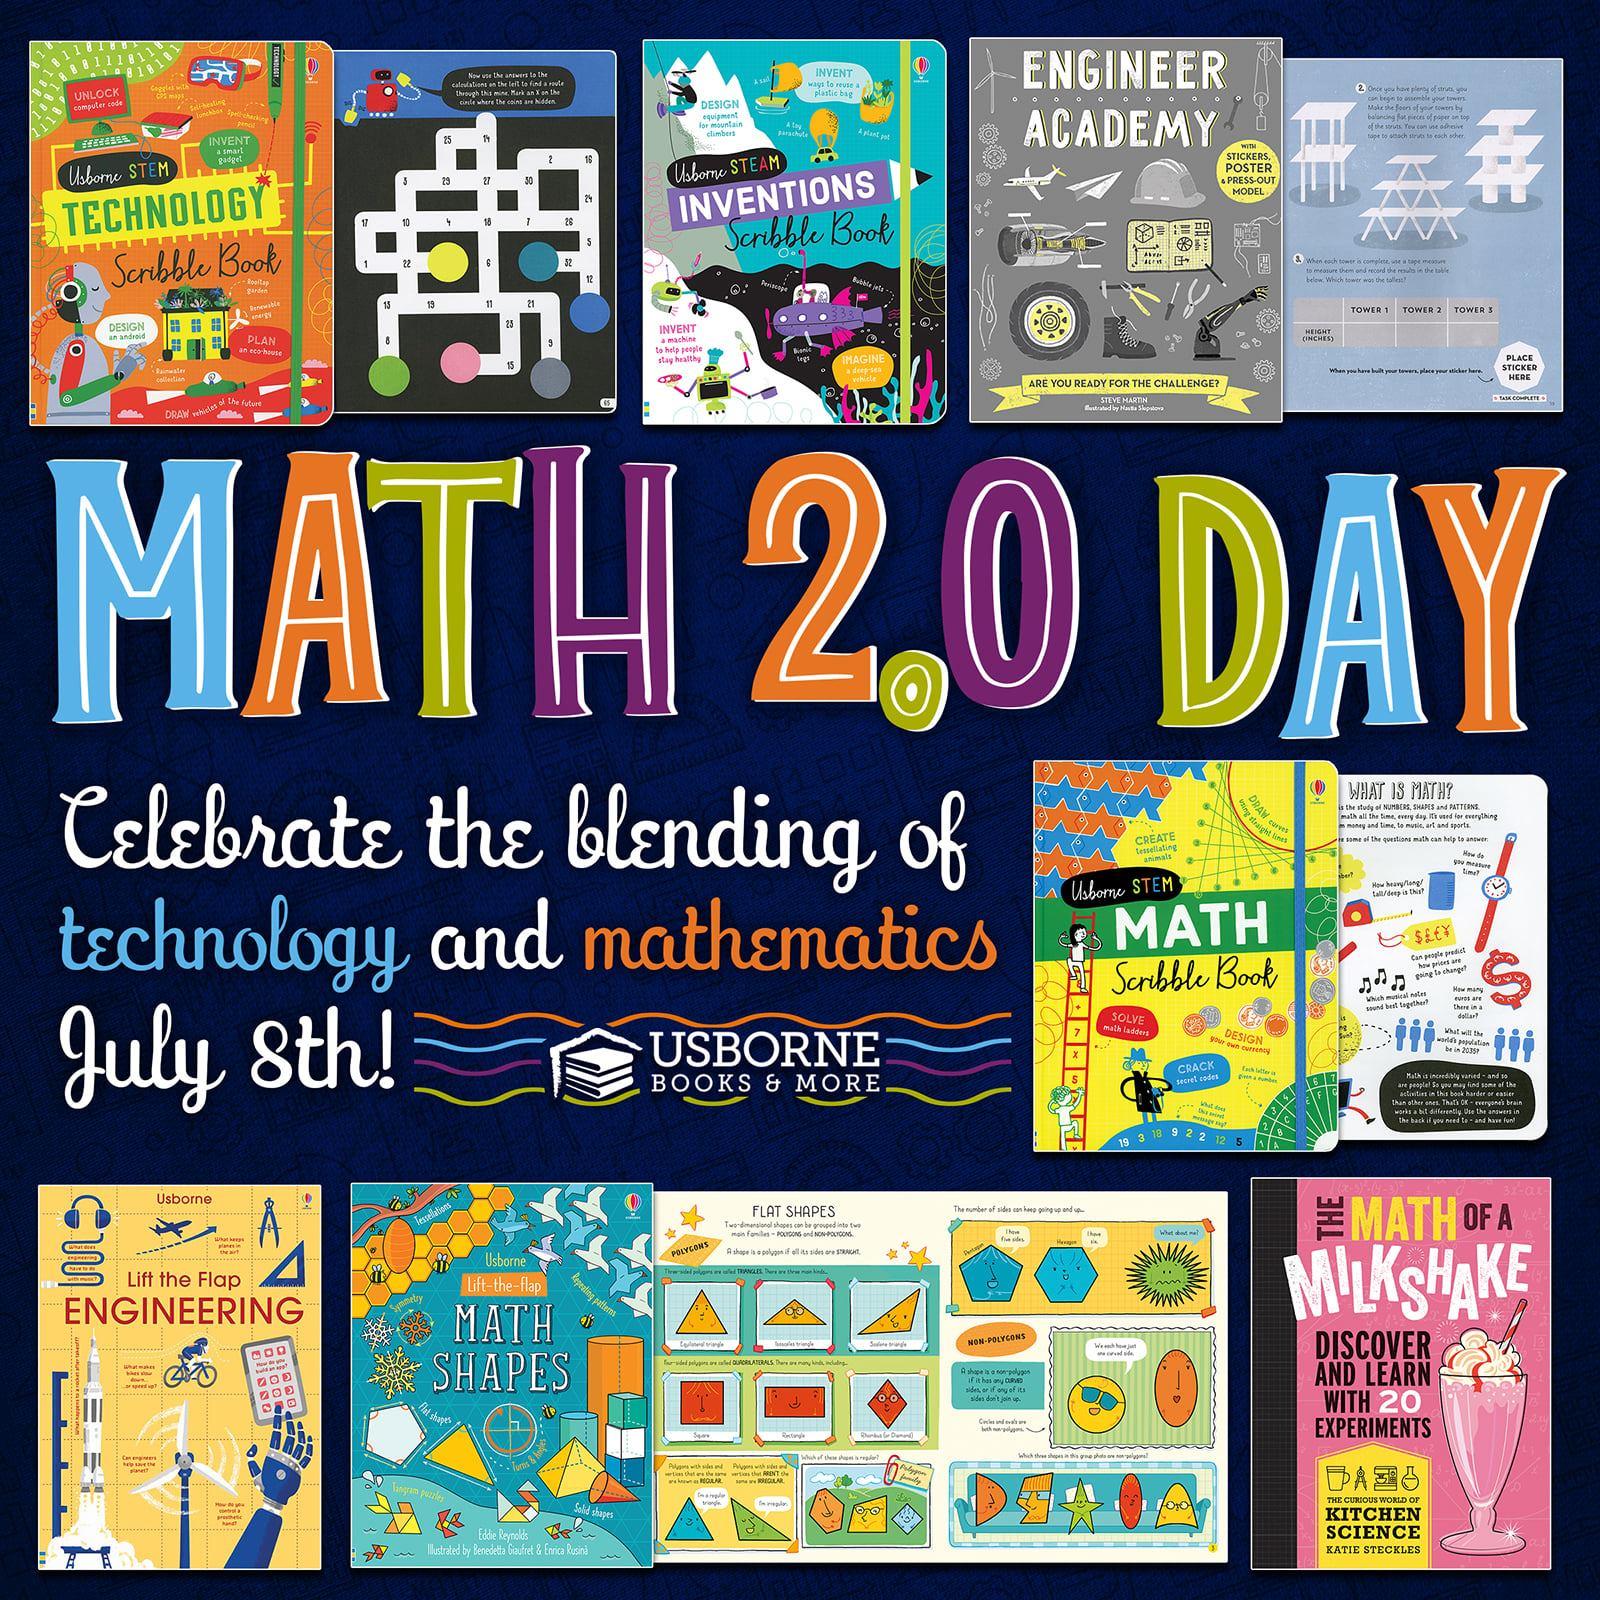 Math 2.0 Day ~ July 8